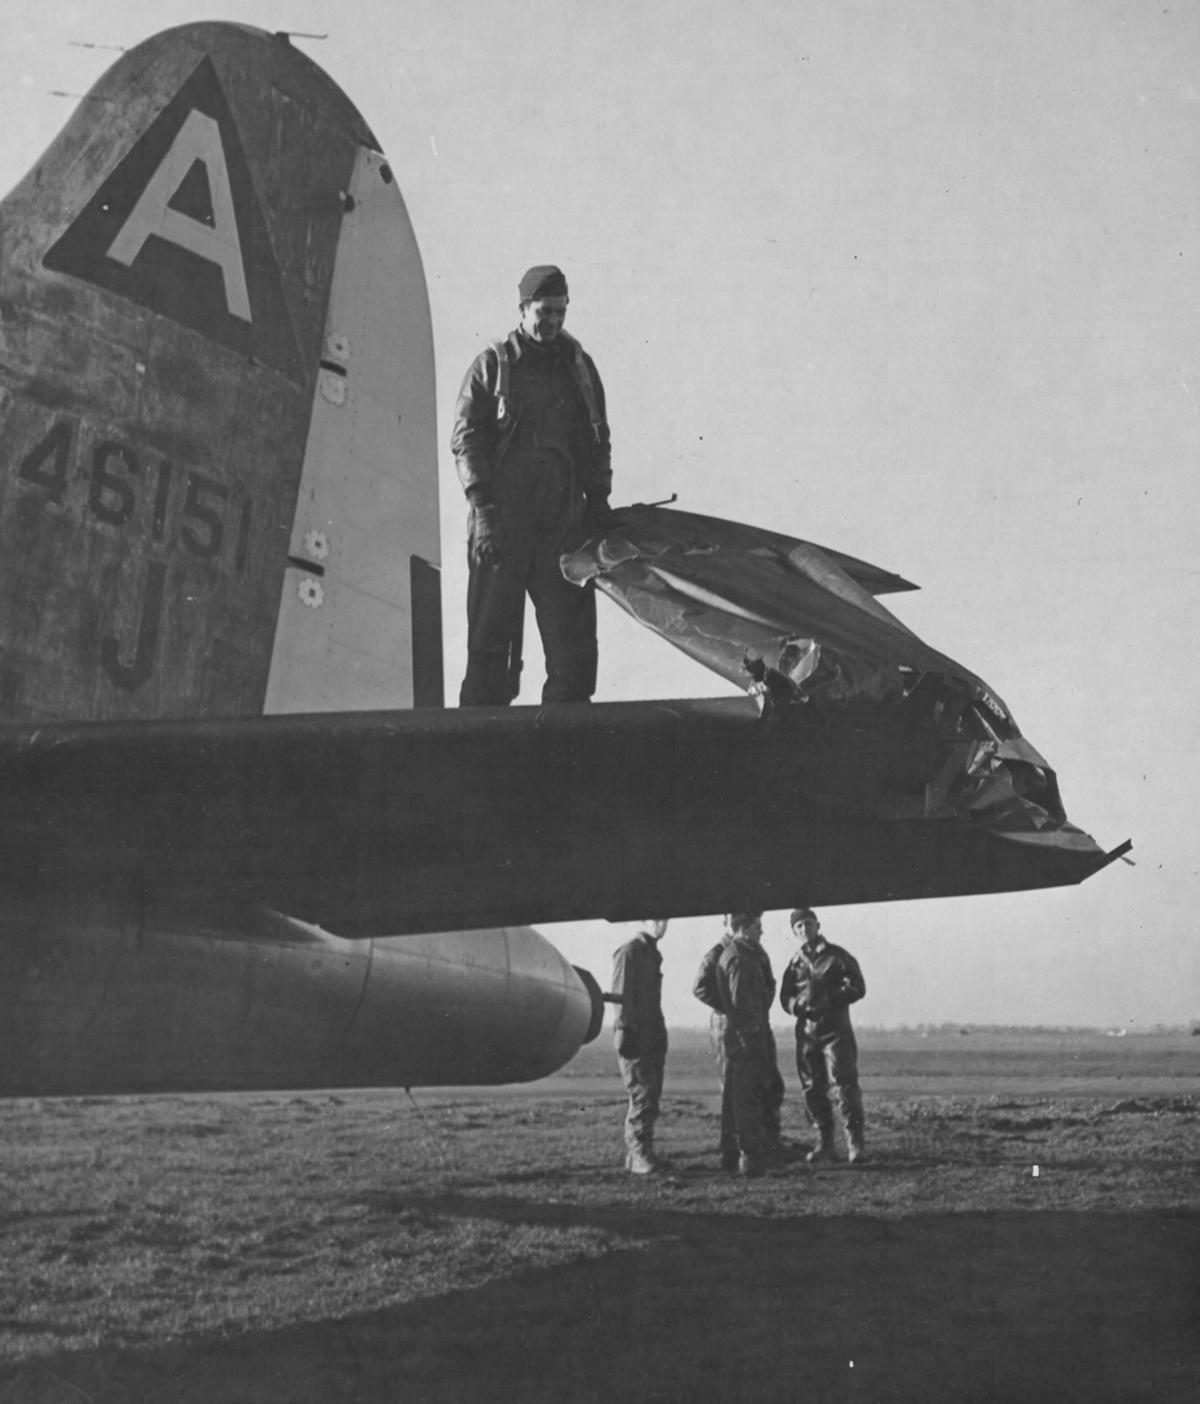 B-17 #44-6151 / Shure Hot